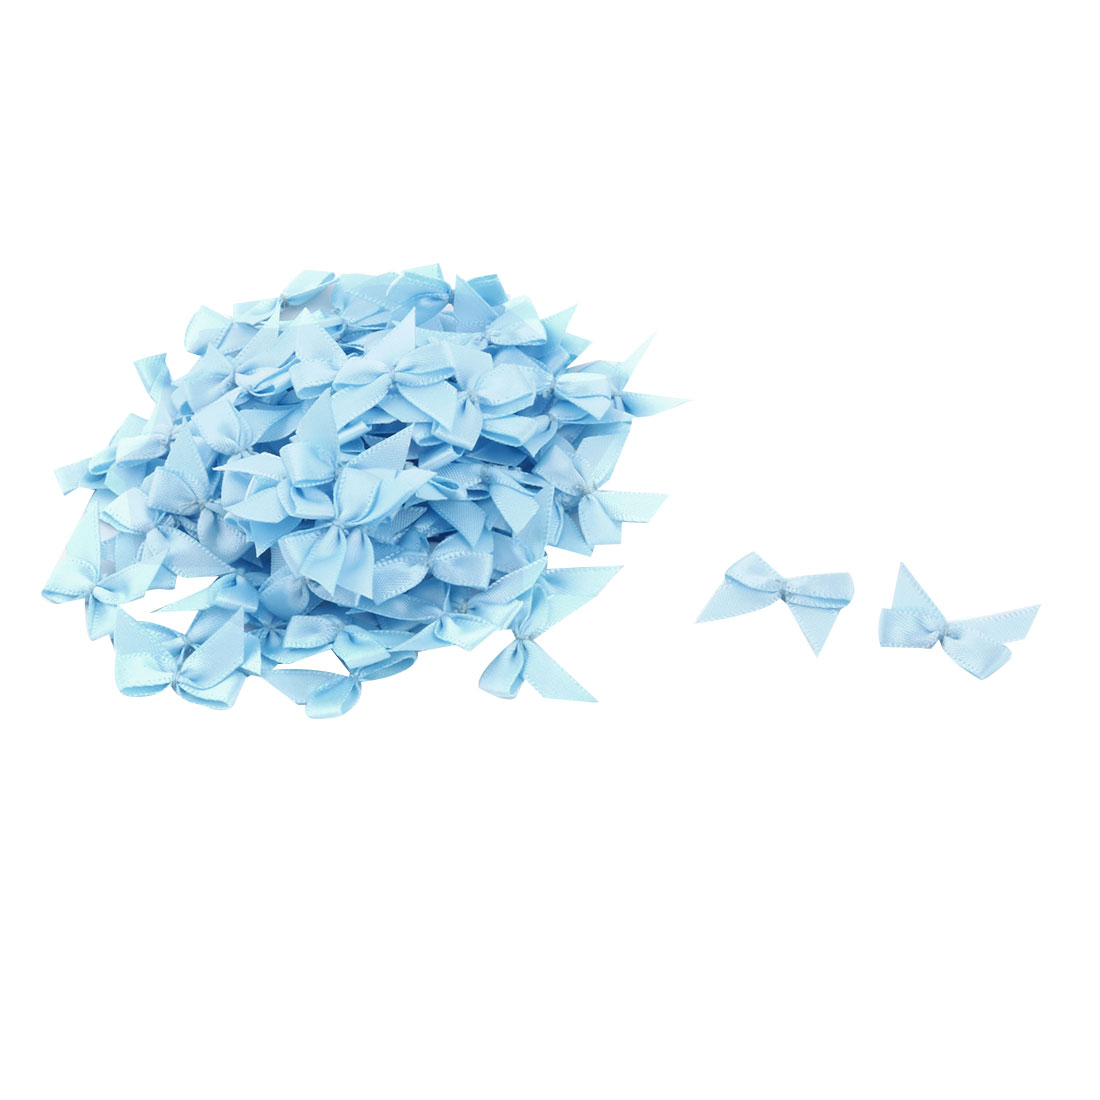 Home Polyester DIY Handcraft Clothing Shirt Scarf Bowknot Bow Light Blue 100 Pcs - image 3 de 3